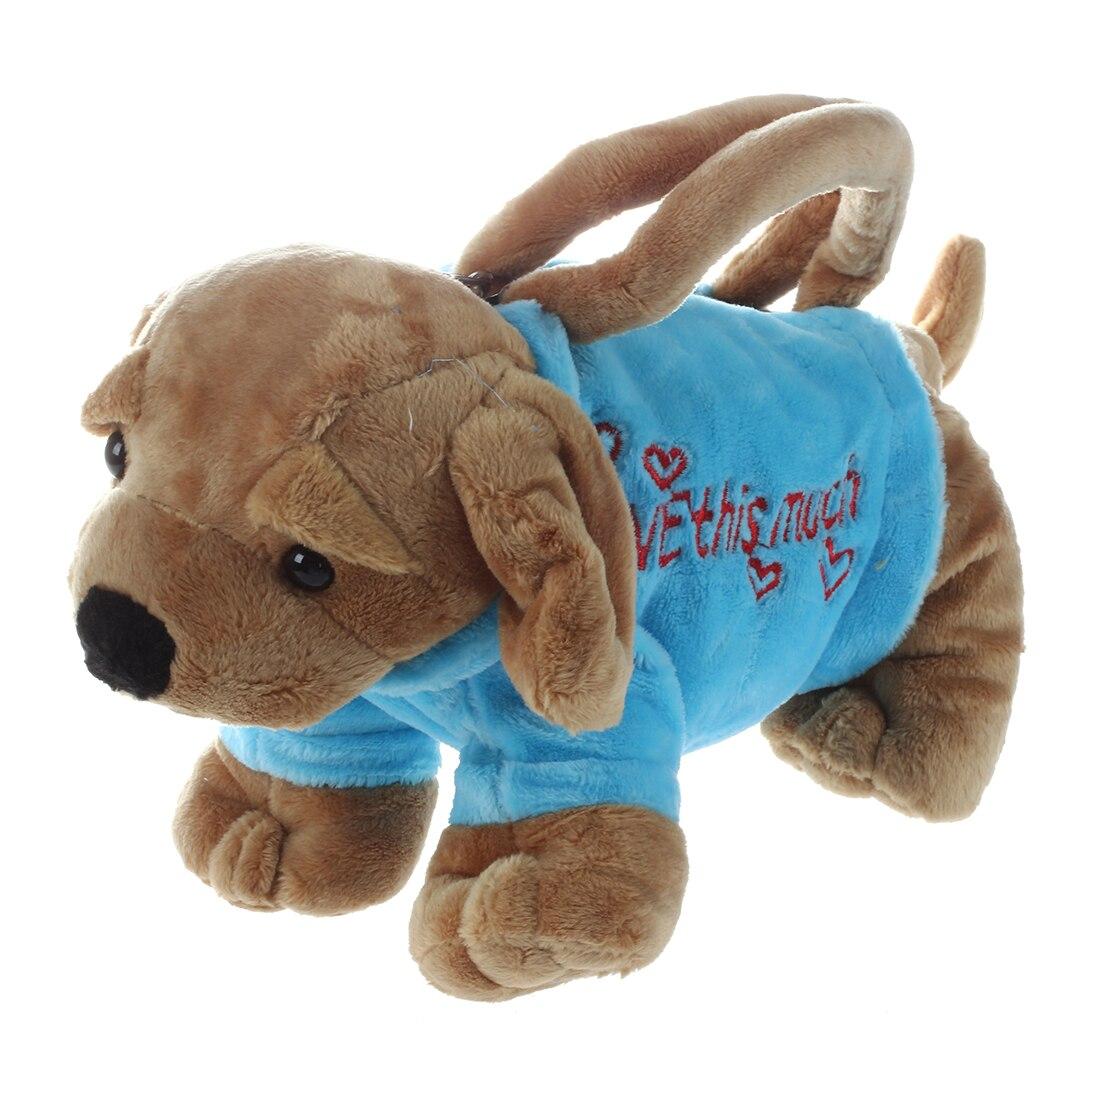 bolsa cachorrinho forma bonito stuffed Exterior : Nenhum